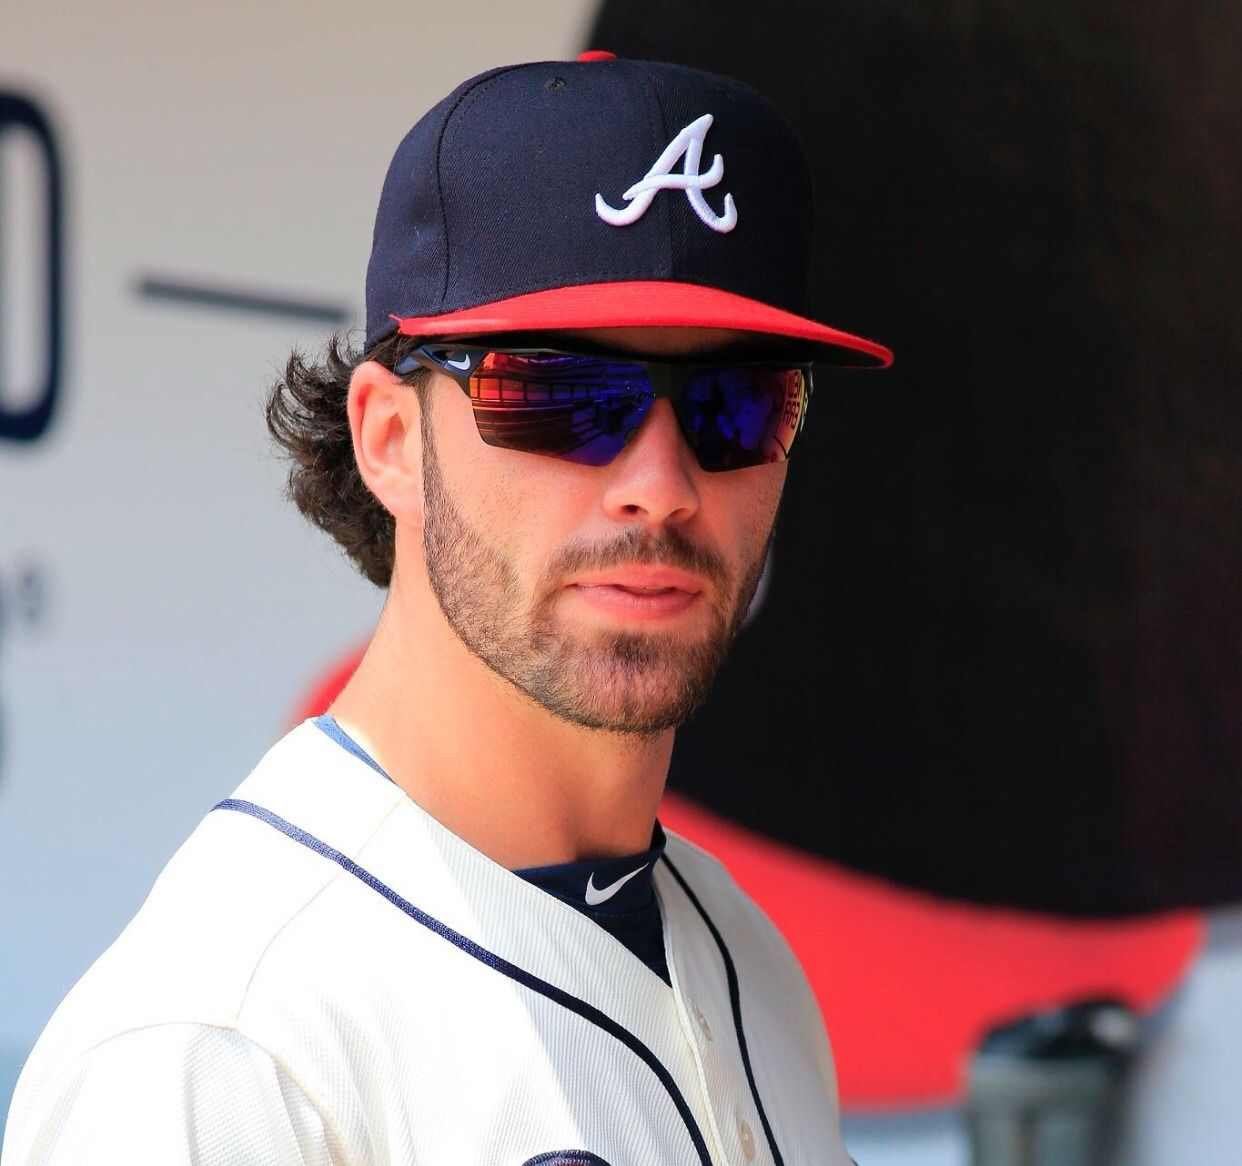 Pin By Catherine Ledbetter On Atlanta Braves Baseball Atlanta Baseball Hot Baseball Players Atlanta Braves Baseball